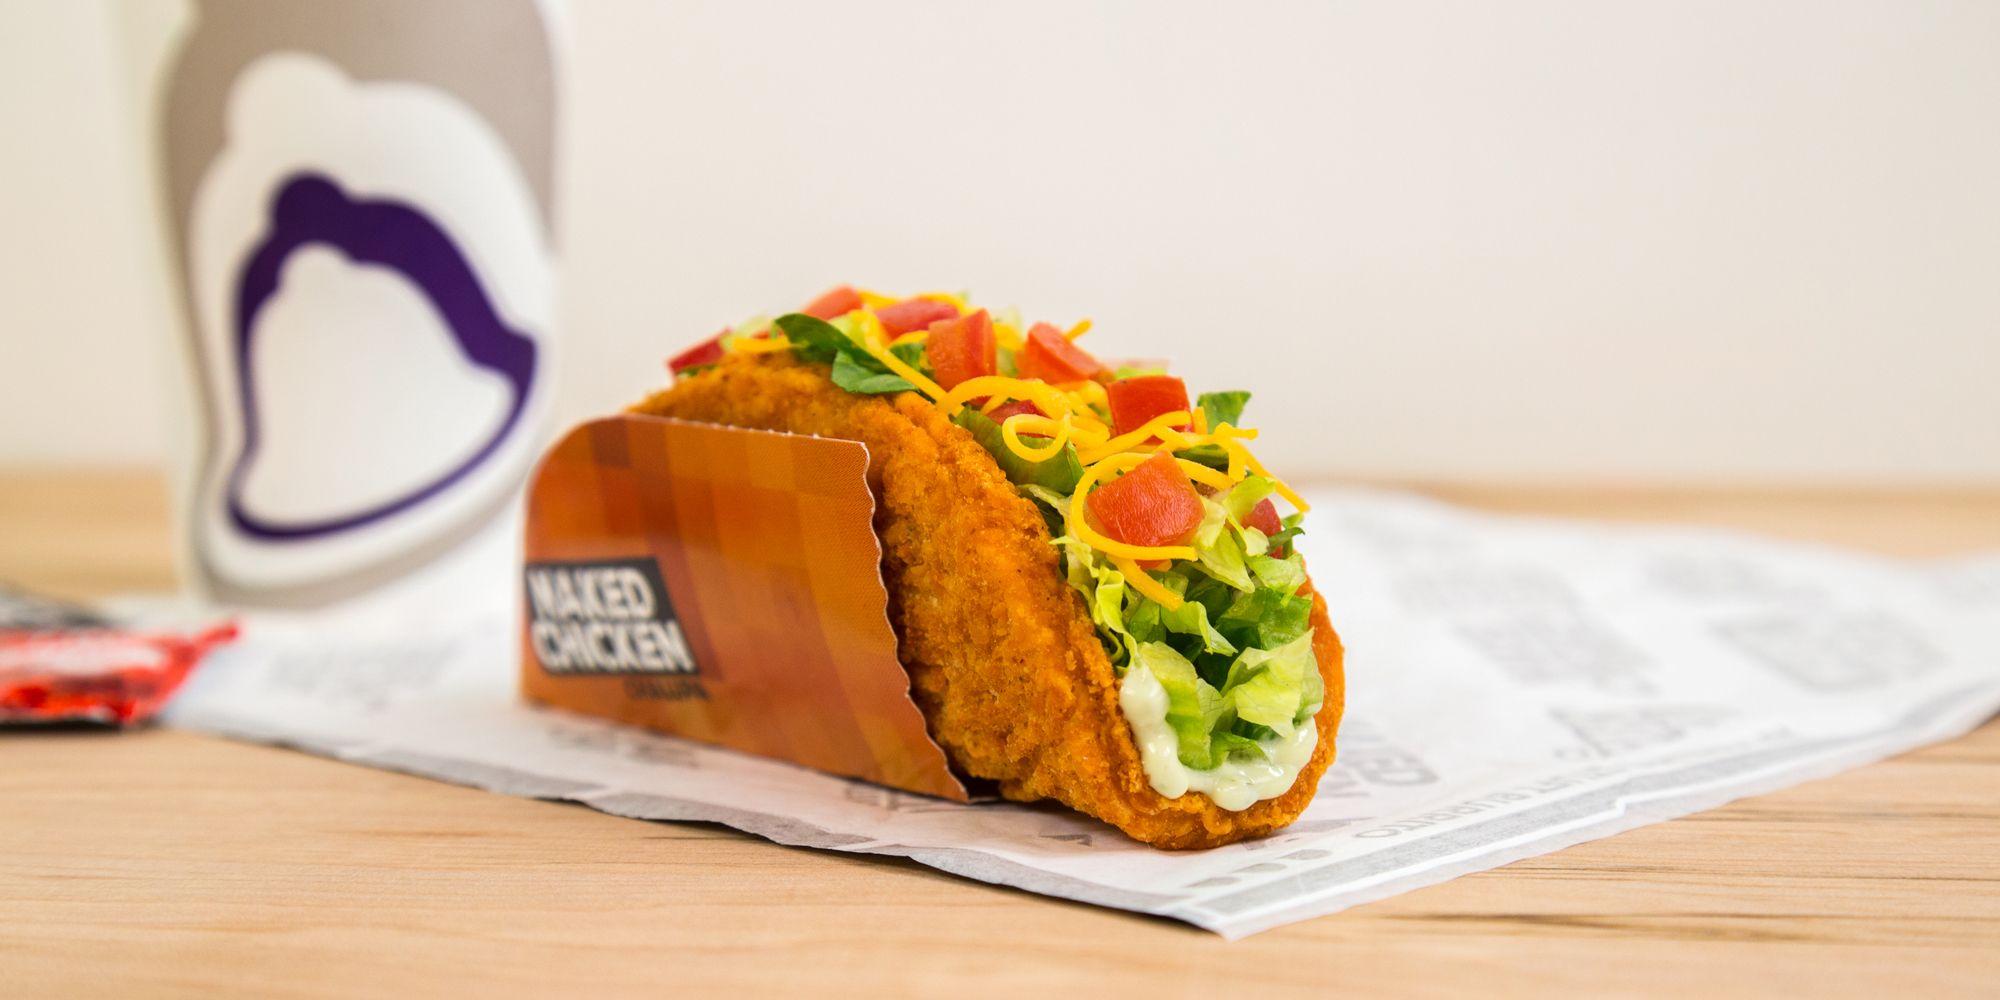 Fullsize Of Taco Bell Chalupa Box